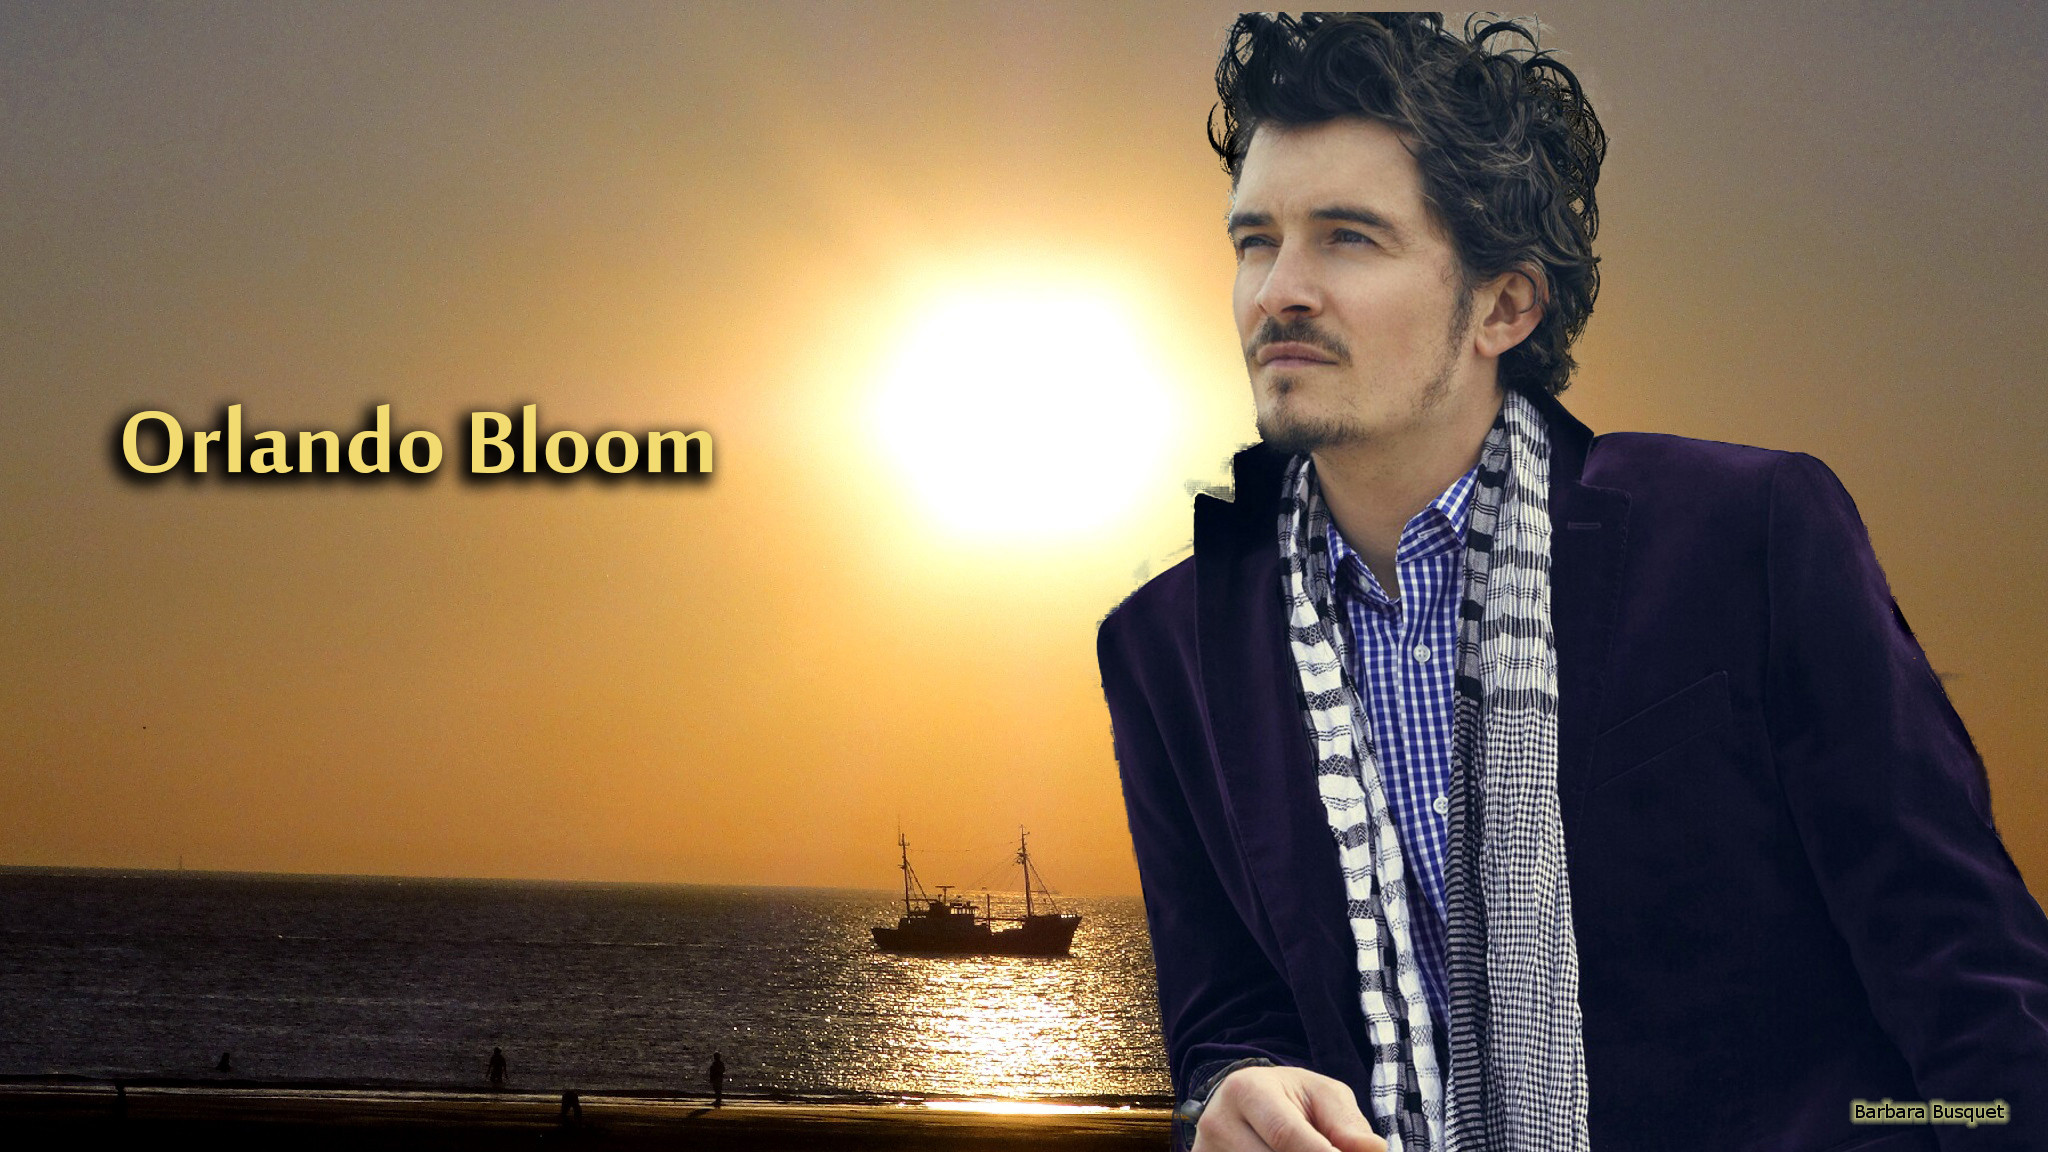 Hd wallpaper pirates of the caribbean - Orlando Bloom Wallpapers Barbaras Hd Wallpapers